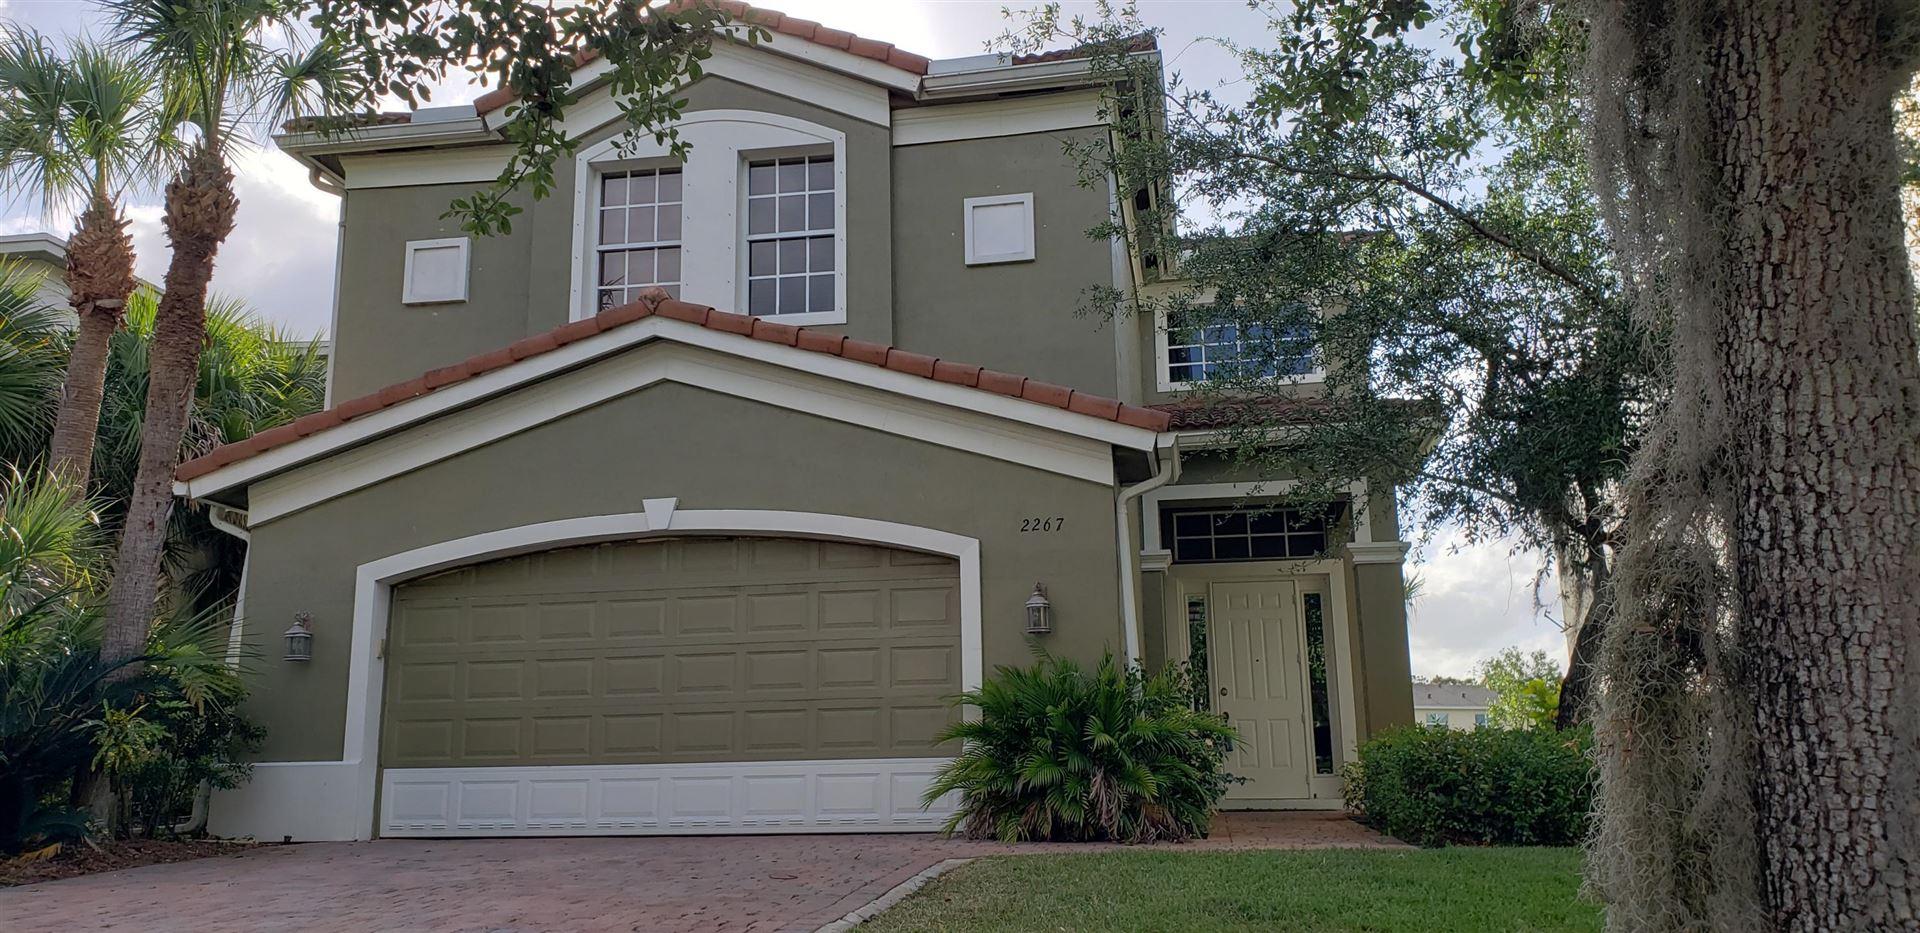 2267 NW Padova Street, Port Saint Lucie, FL 34986 - #: RX-10706216